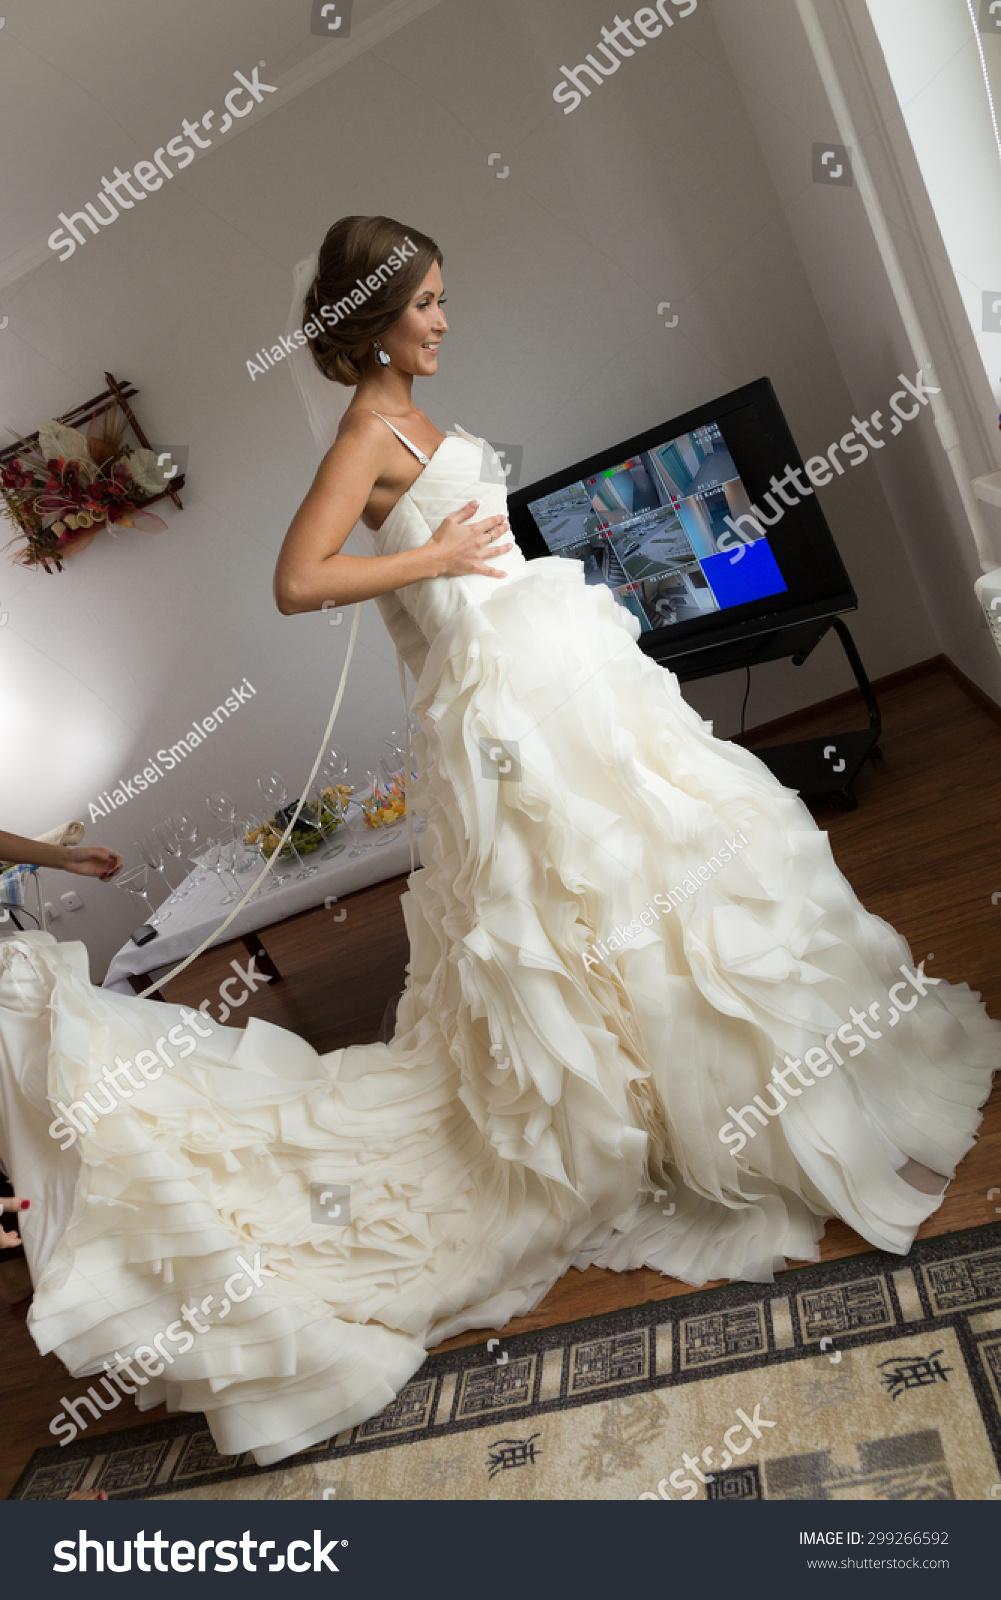 Bride Dressing Gown Bride Preparing Wedding Stock Photo Edit Now 299266592,Beach Flowy Sleeveless Beach Flowy Wedding Dresses